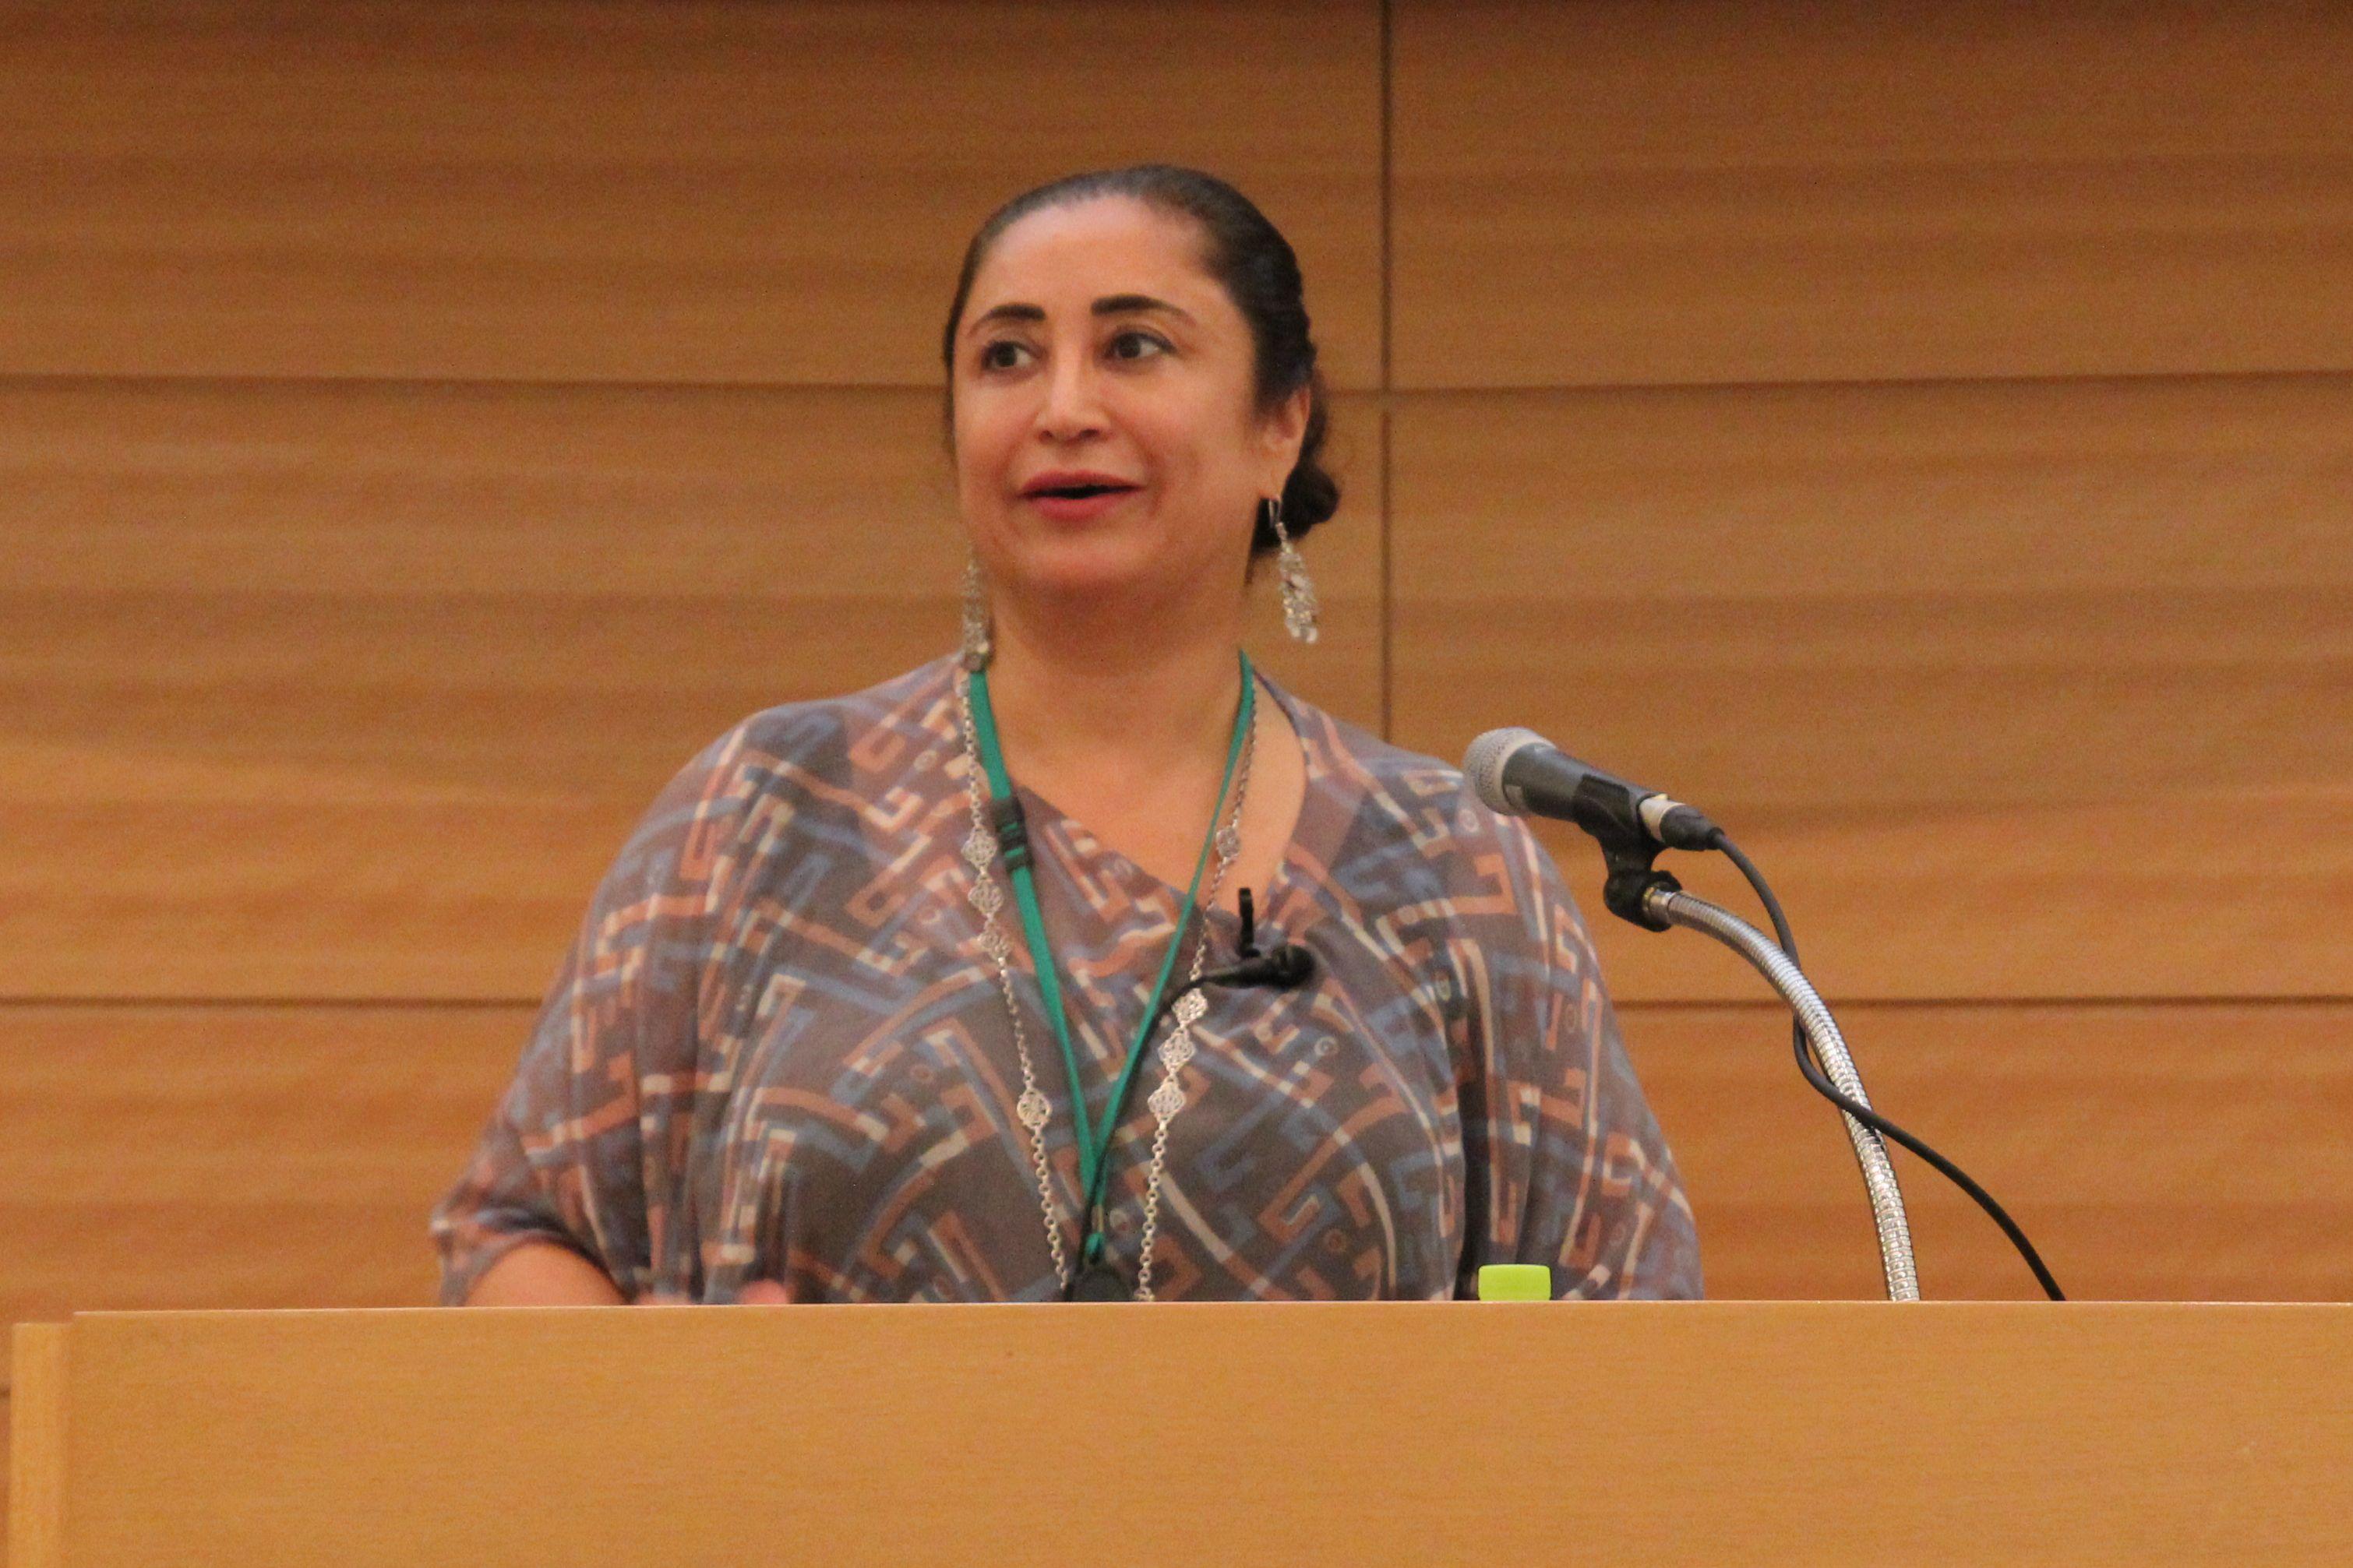 Public seminar on co-operatives and SDGs held